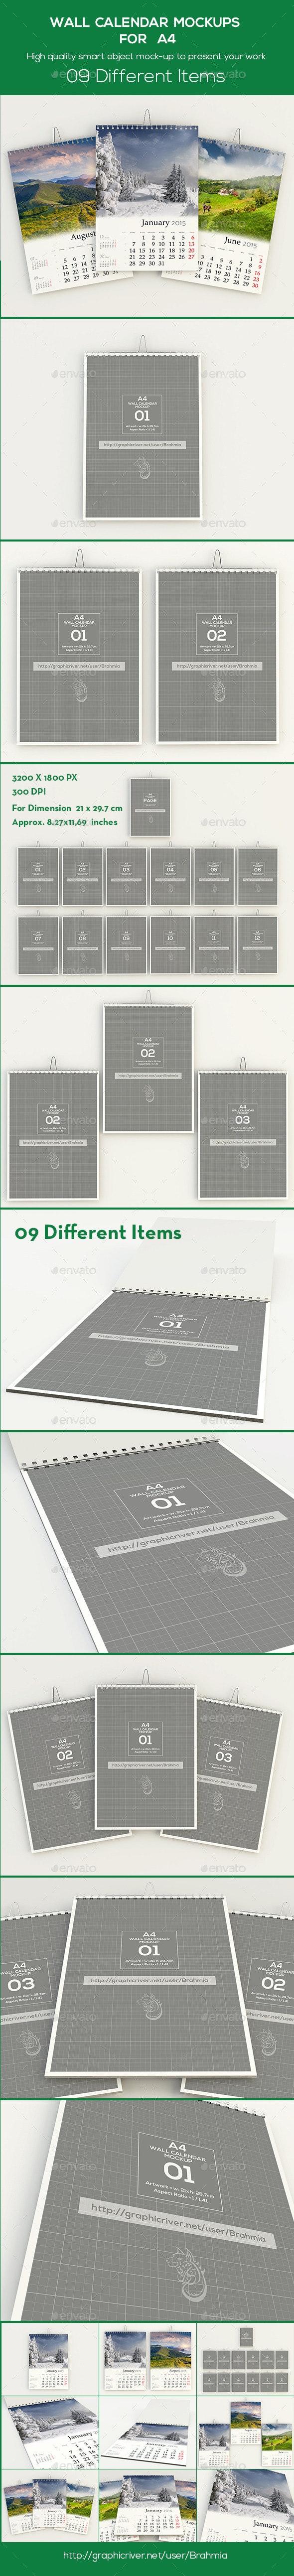 Wall Calendar Mockups For A4 - Miscellaneous Print